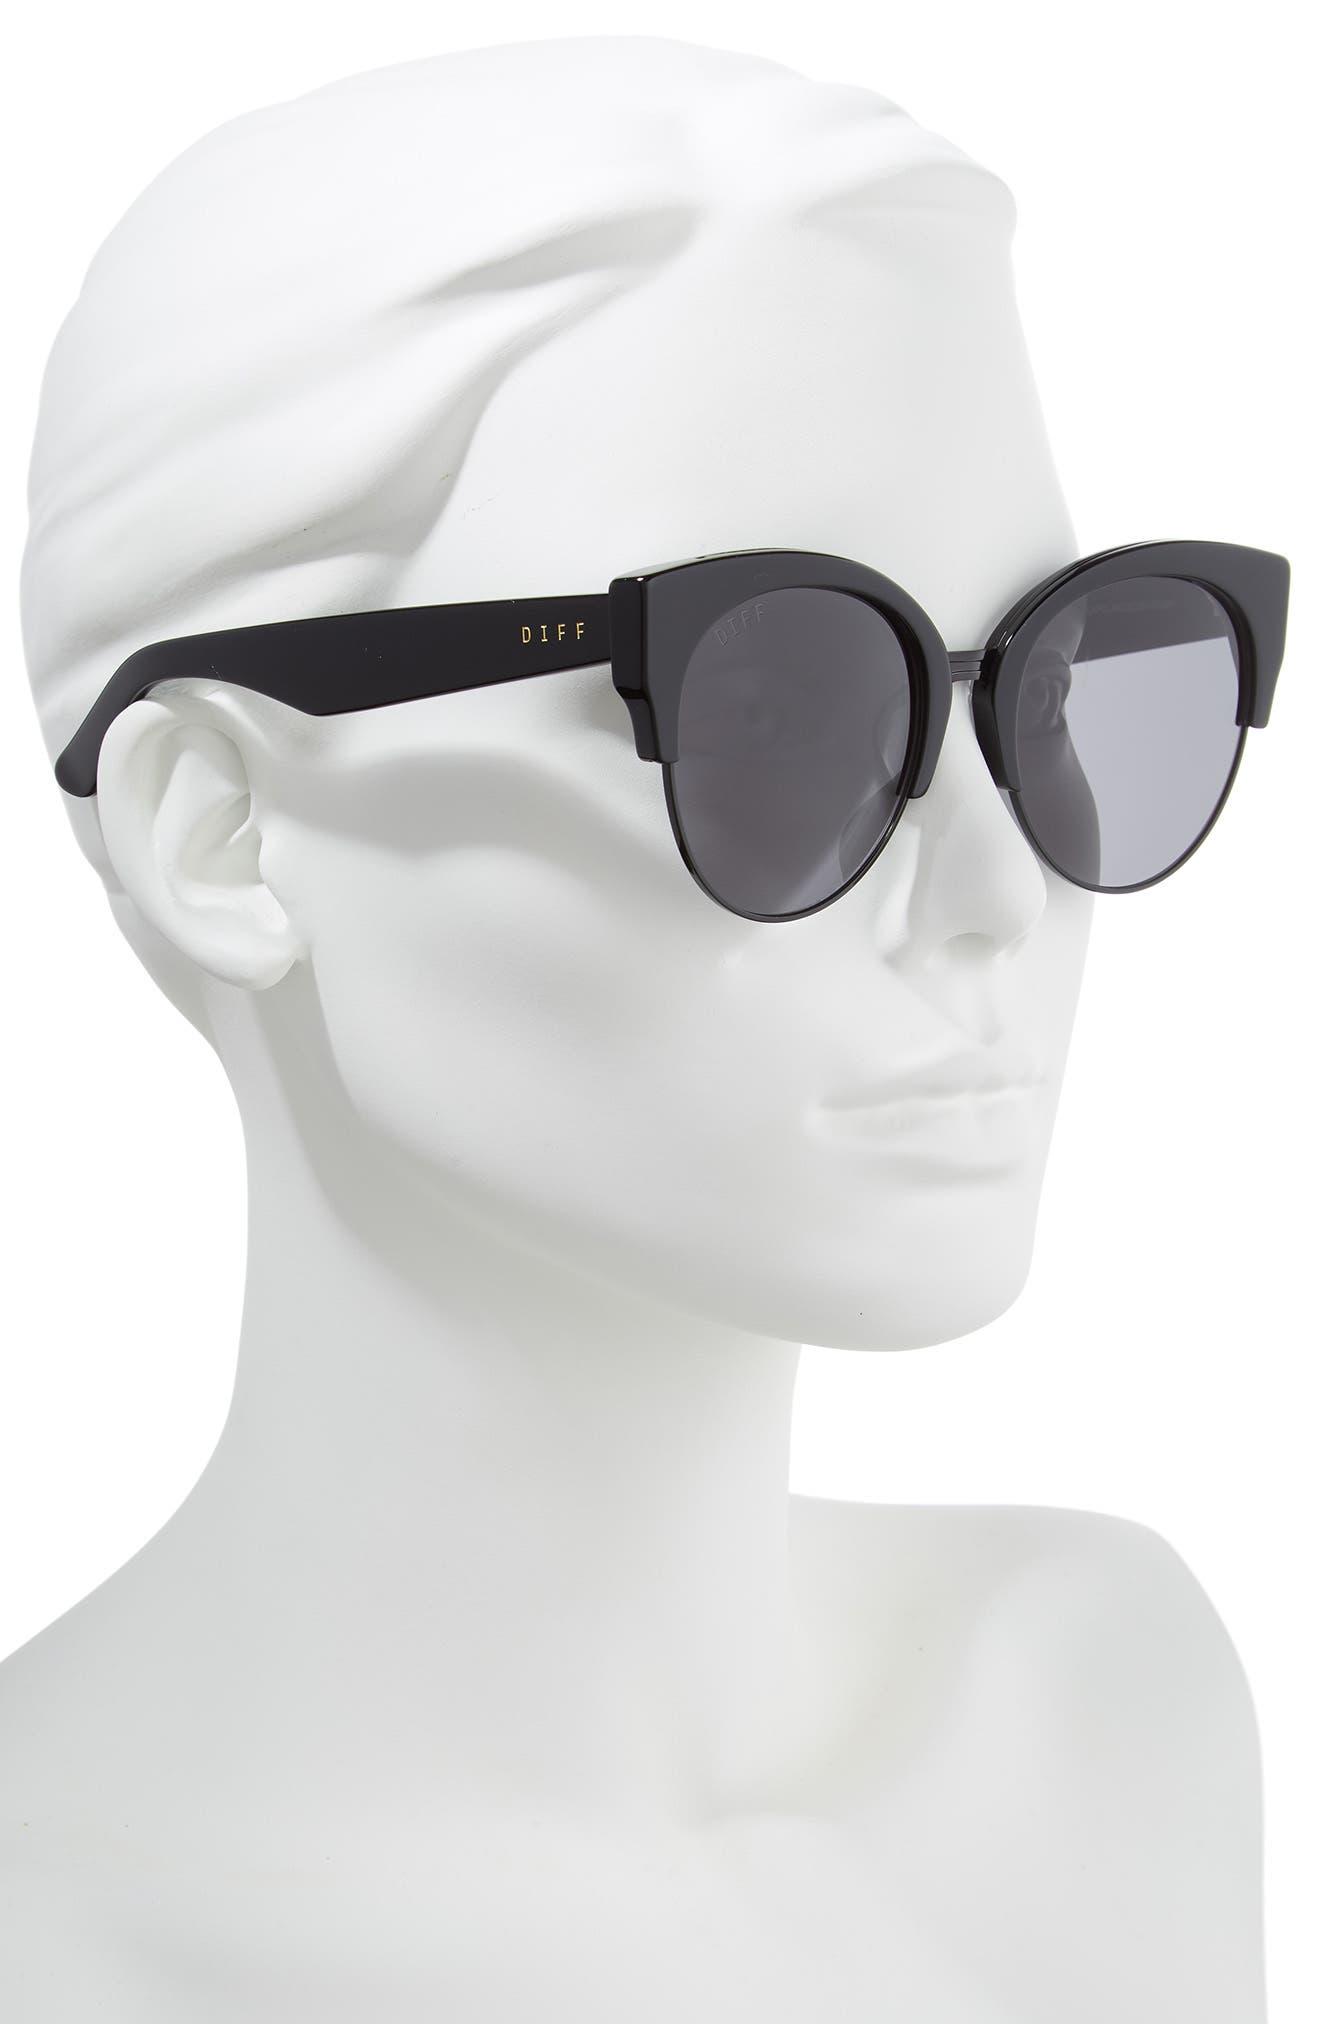 Stella 55mm Polarized Cat Eye Sunglasses,                             Alternate thumbnail 2, color,                             BLACK/ GREY